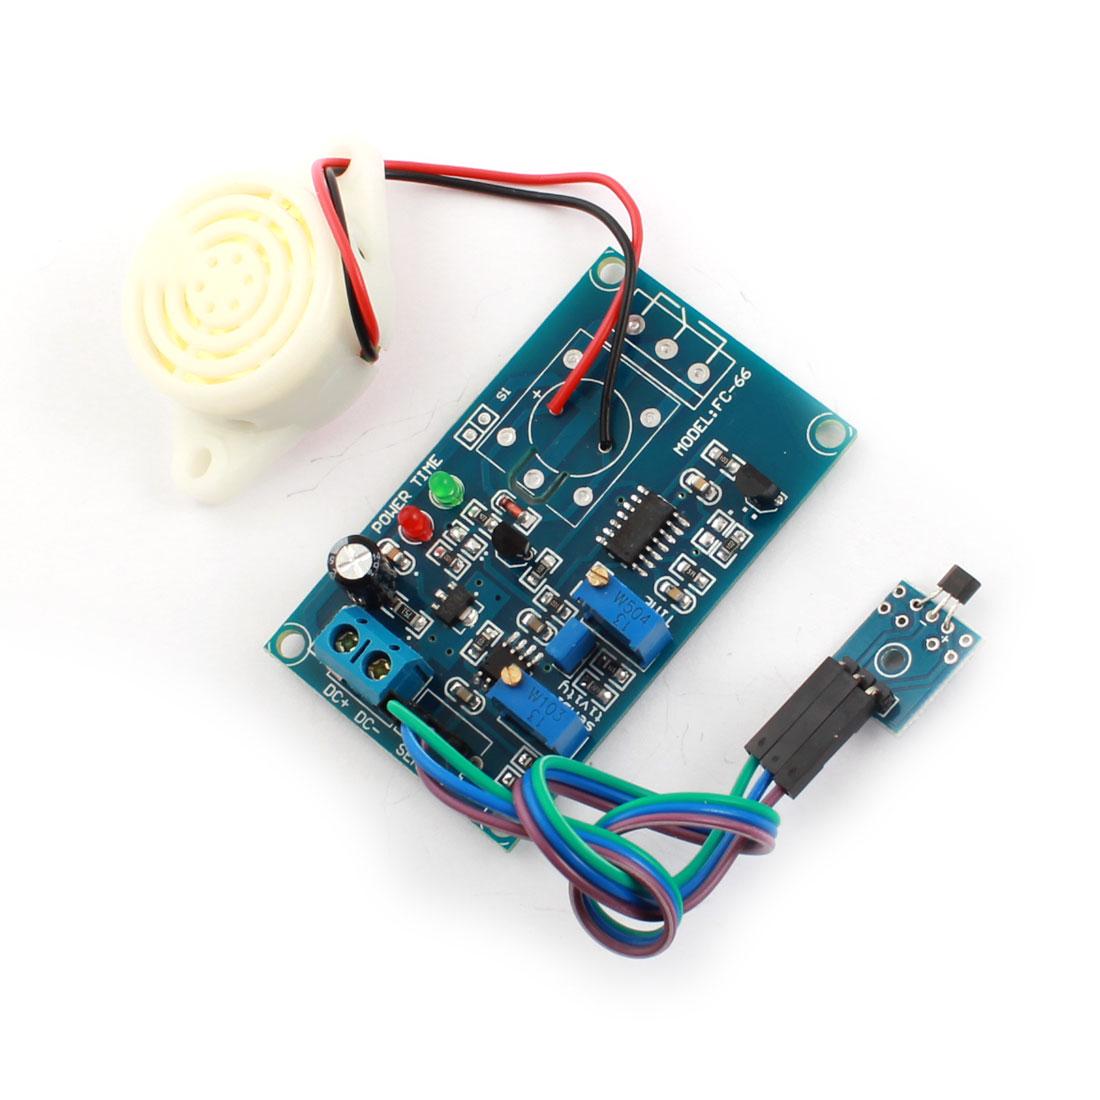 FC-66 DC 24V 20s 200s Hall Effect Sensor No Magnetic Trigger Delay PCB Circuit Module Green w Piezo Buzzer